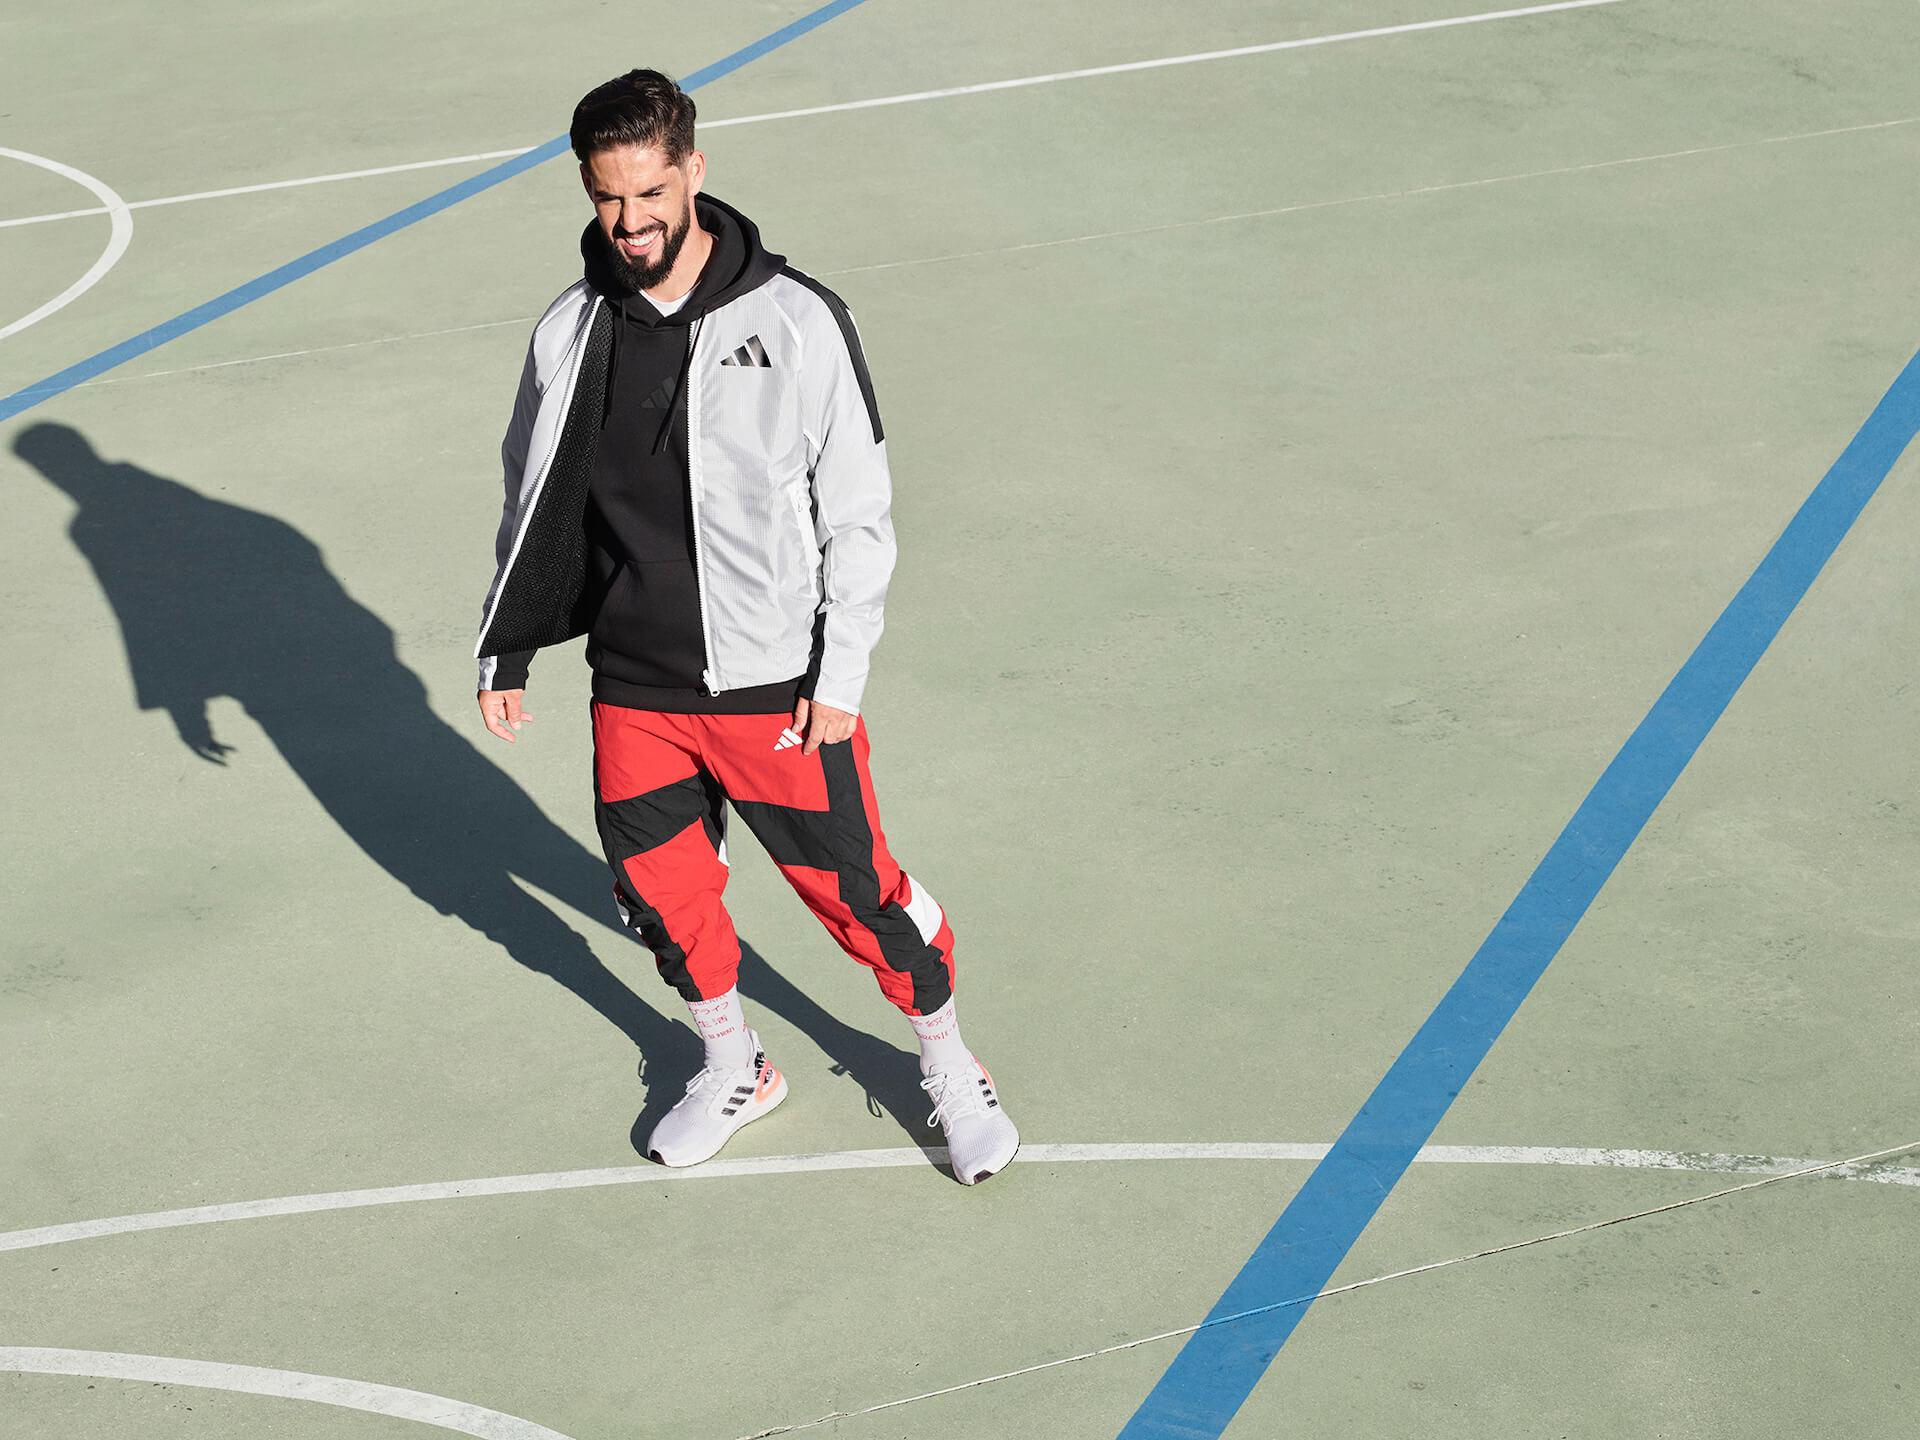 「adidas Athletics」SS20コレクションが発売!キャンペーンビジュアルを務めるコムアイのイメージフィルム本日公開 lf200206_addidasathletics_13